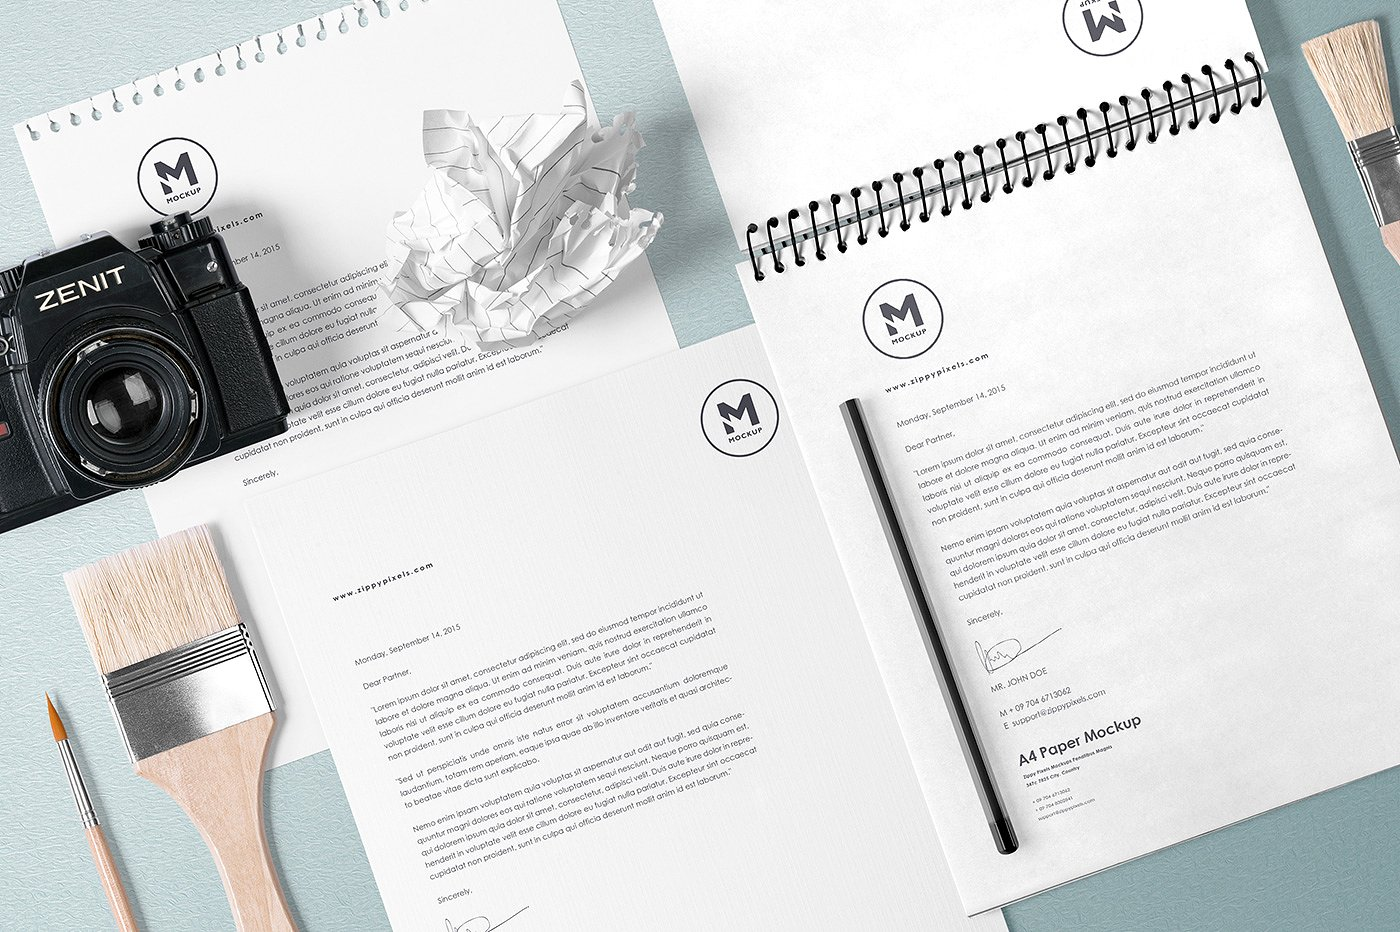 办公创展示样机PSD智能贴图 5 Stunning Stationery Mockups Set